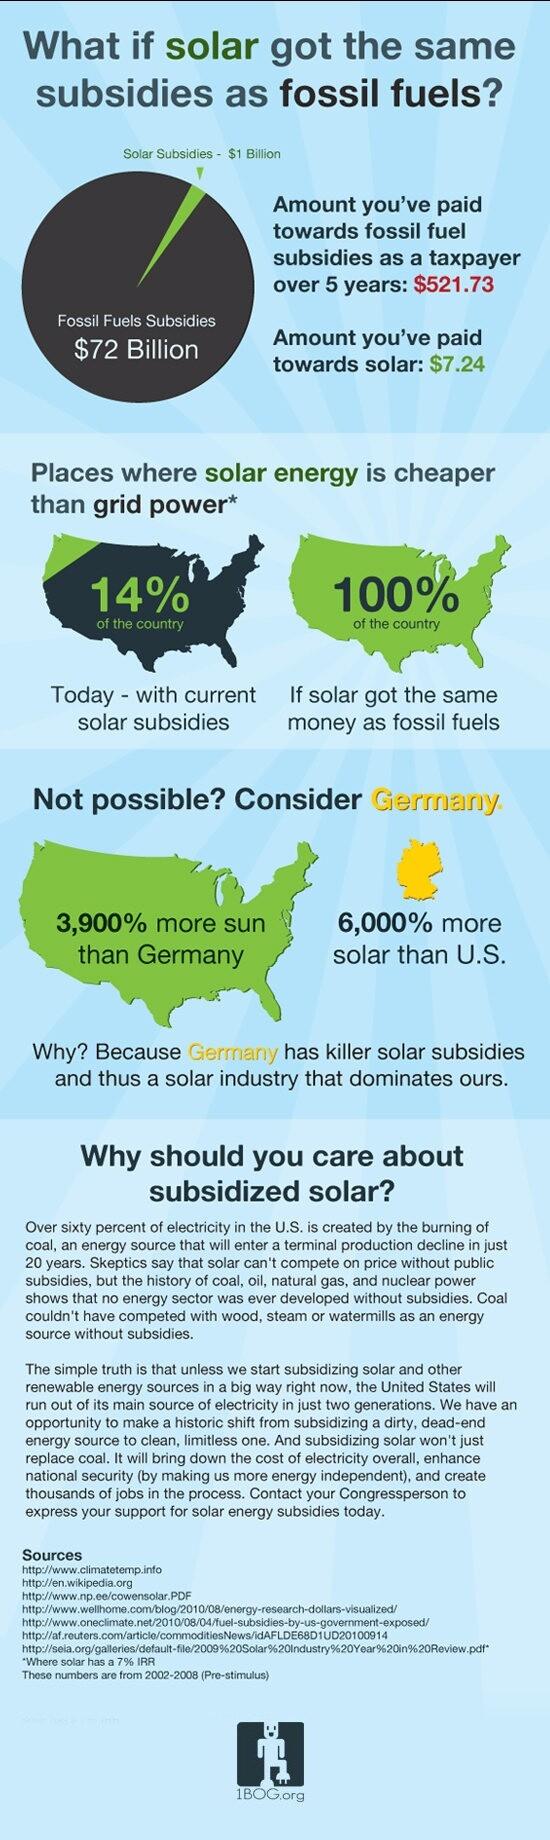 solar-subsidies1